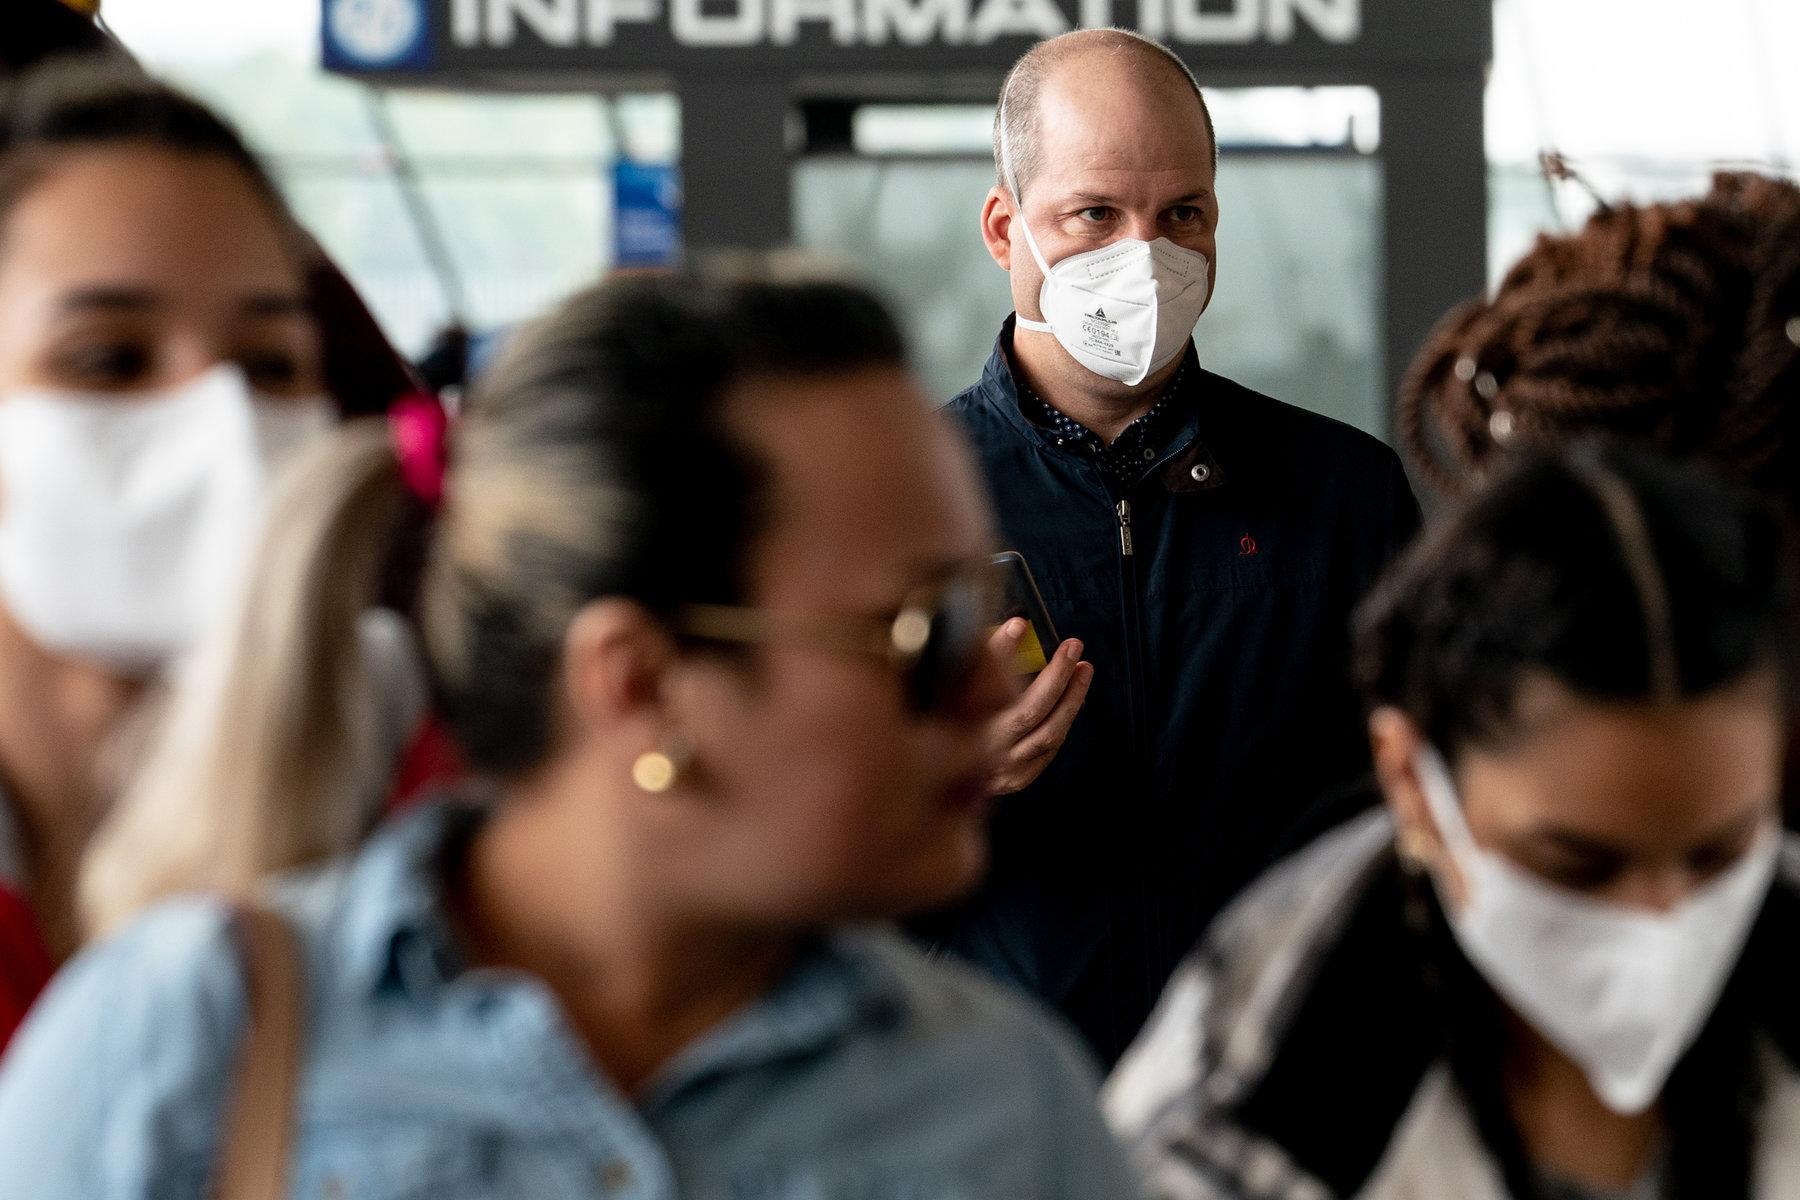 Worst-Case Estimates for U.S. Coronavirus Deaths - The New York Times